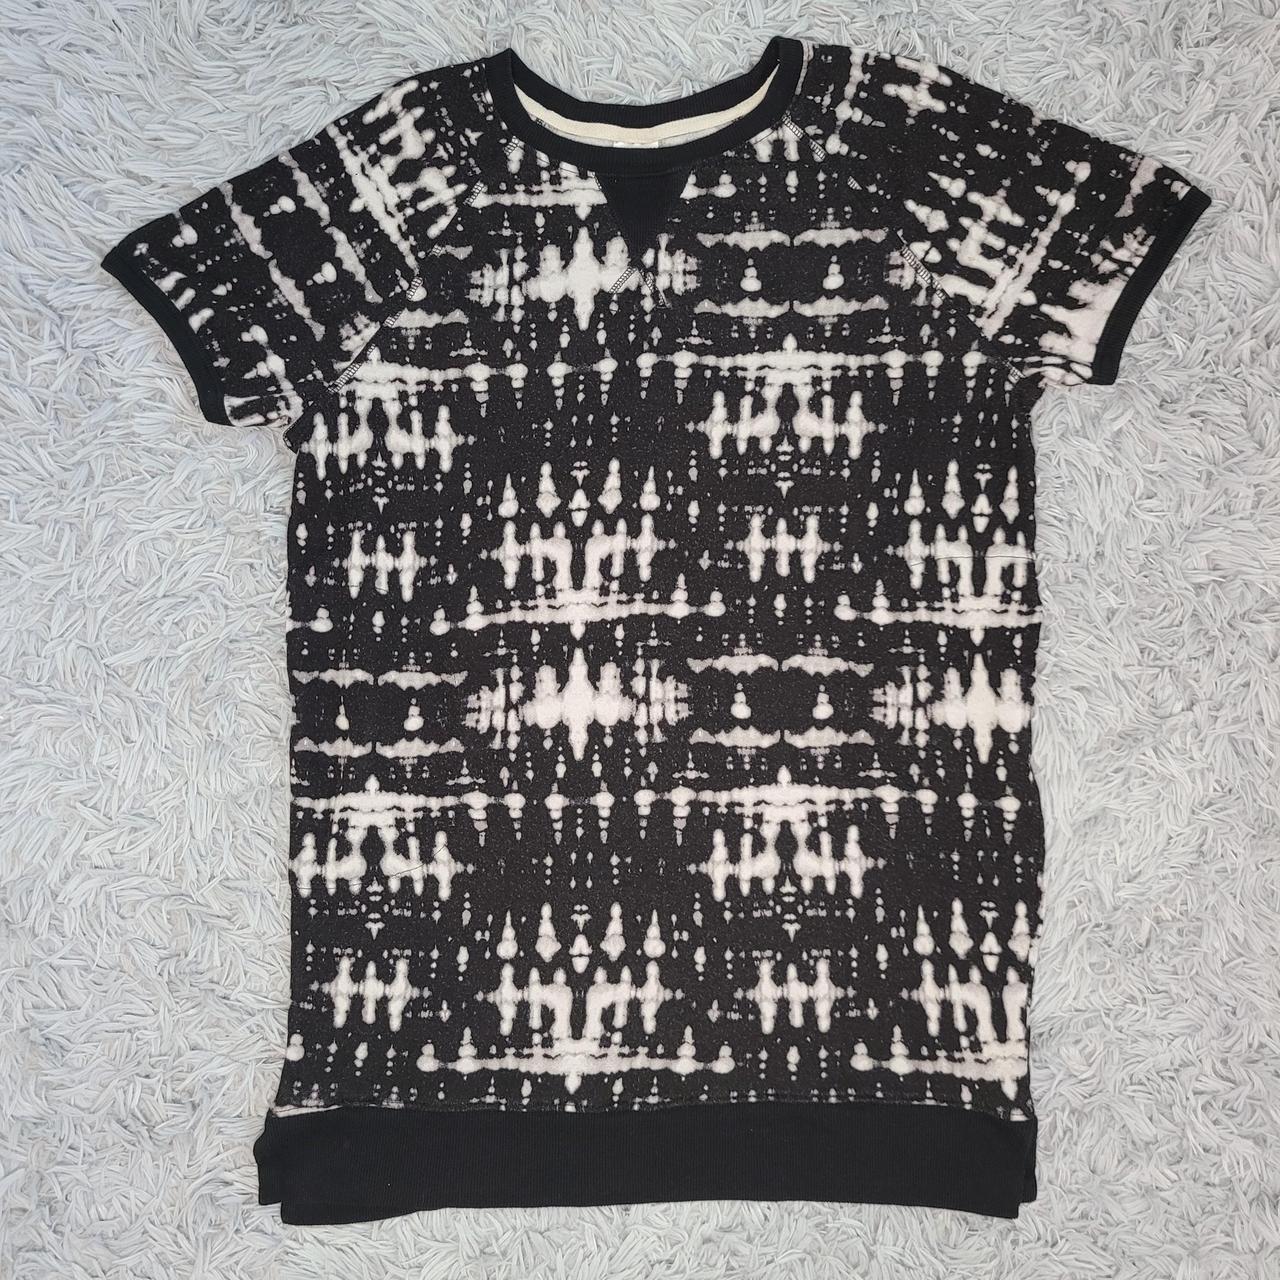 Product Image 1 - Pajama sweater dress with pocketssss  Faint